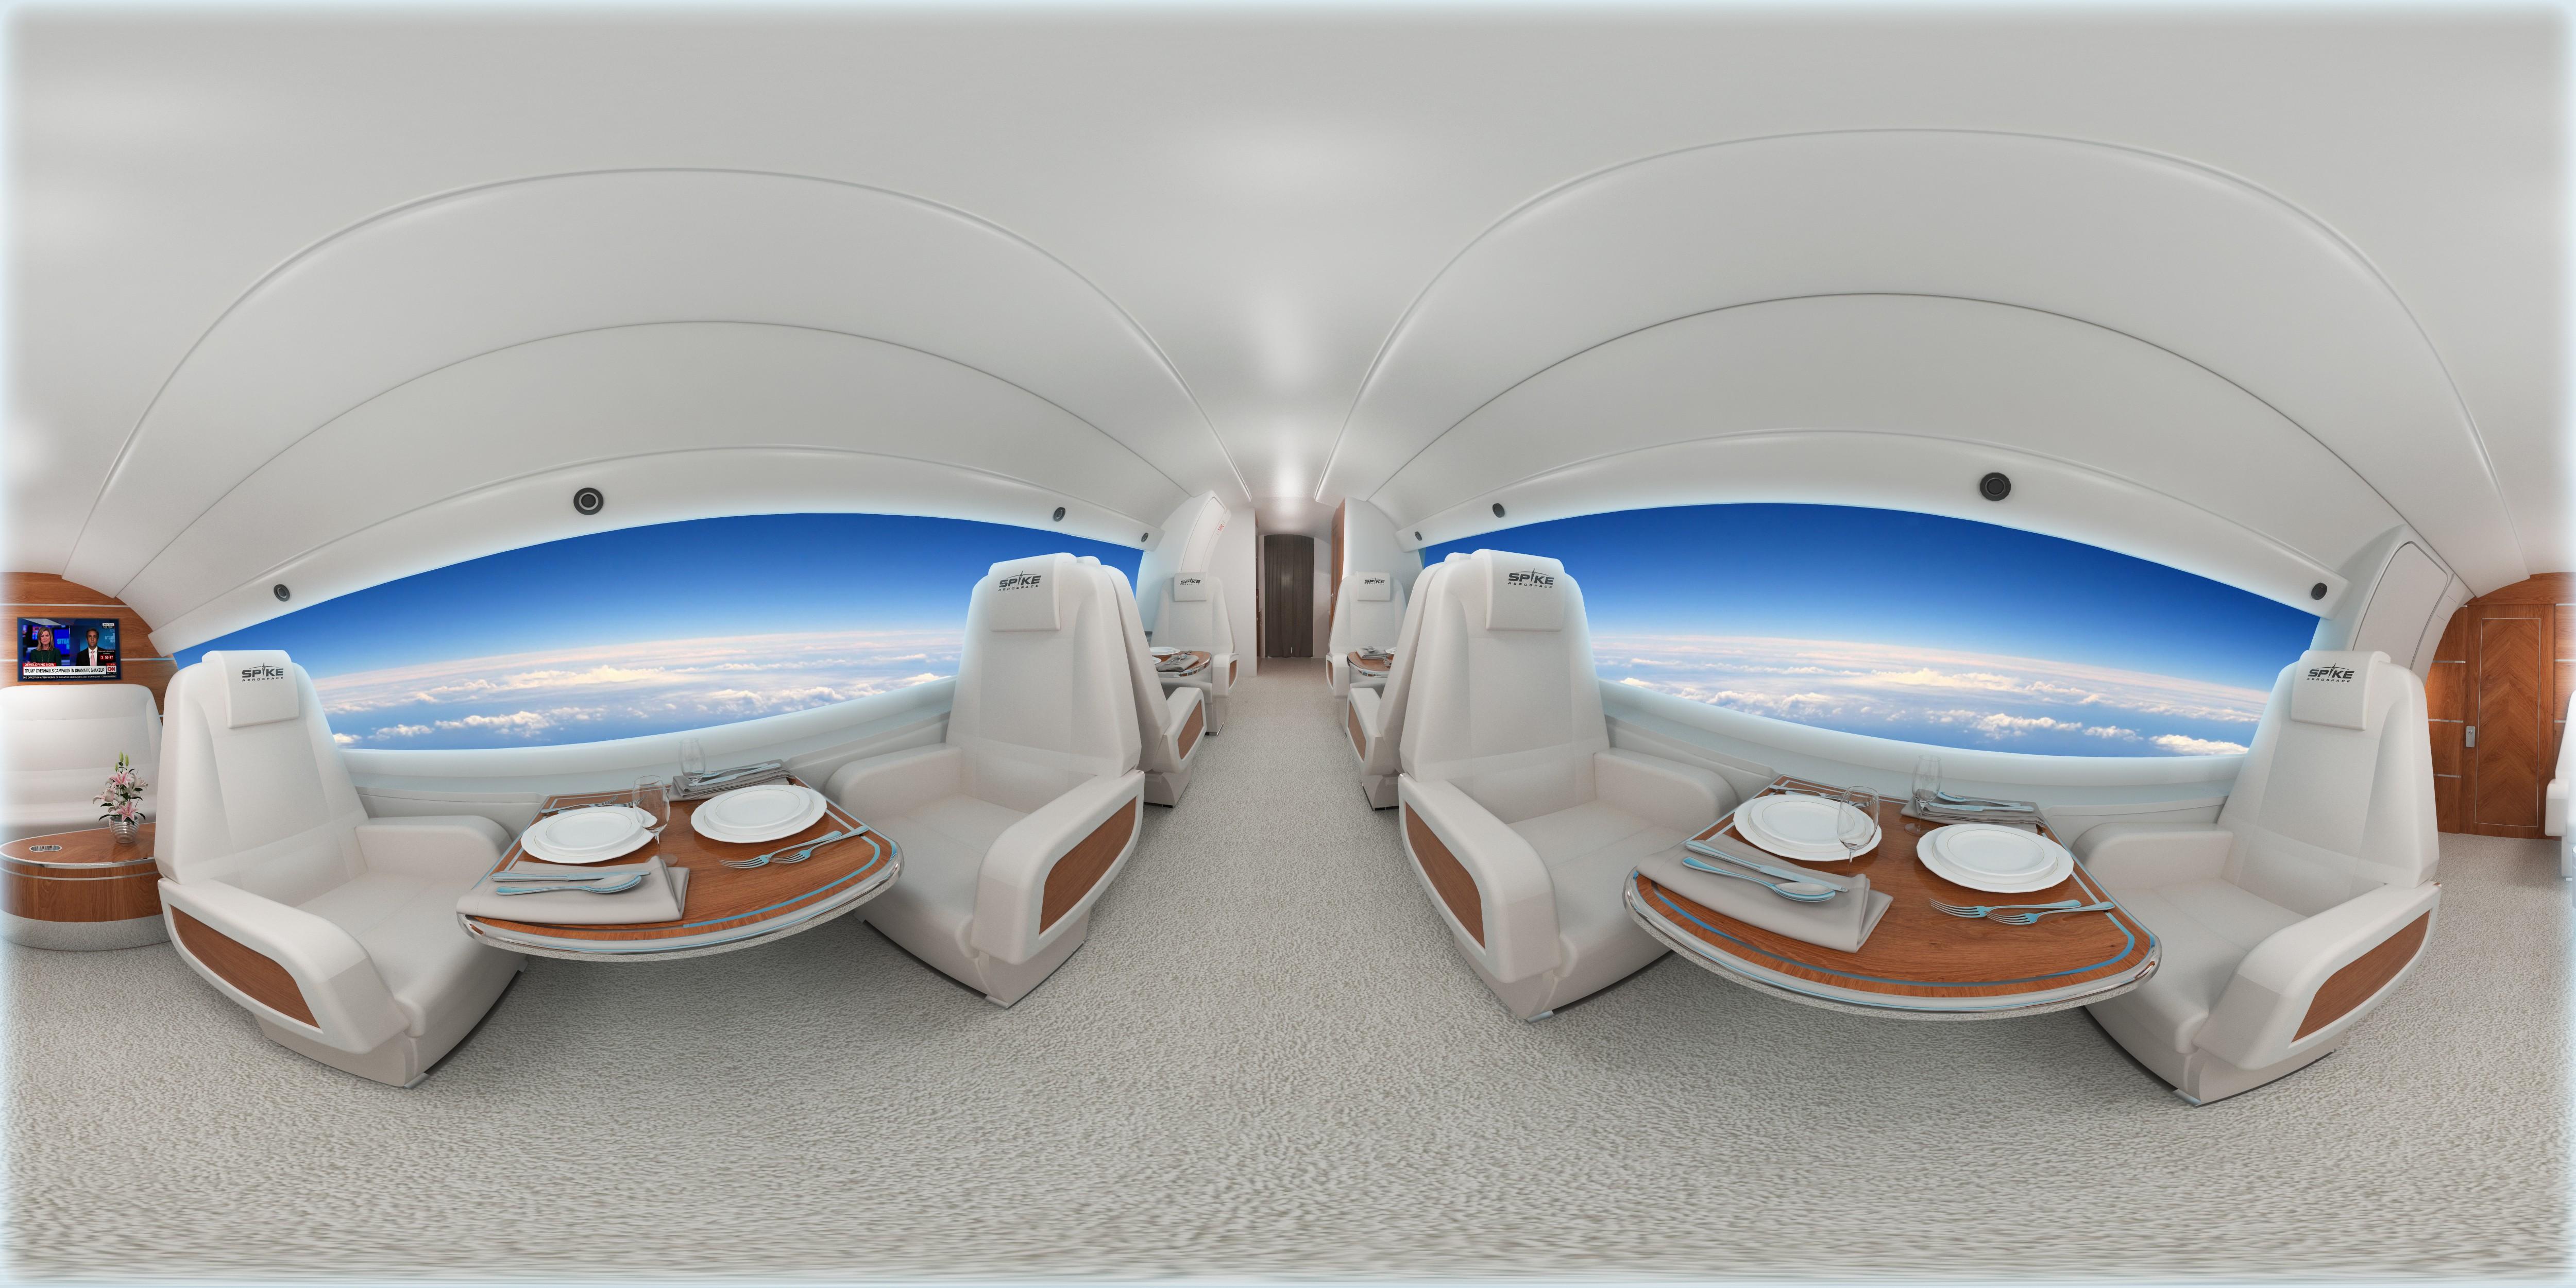 Spike Cabin VR360